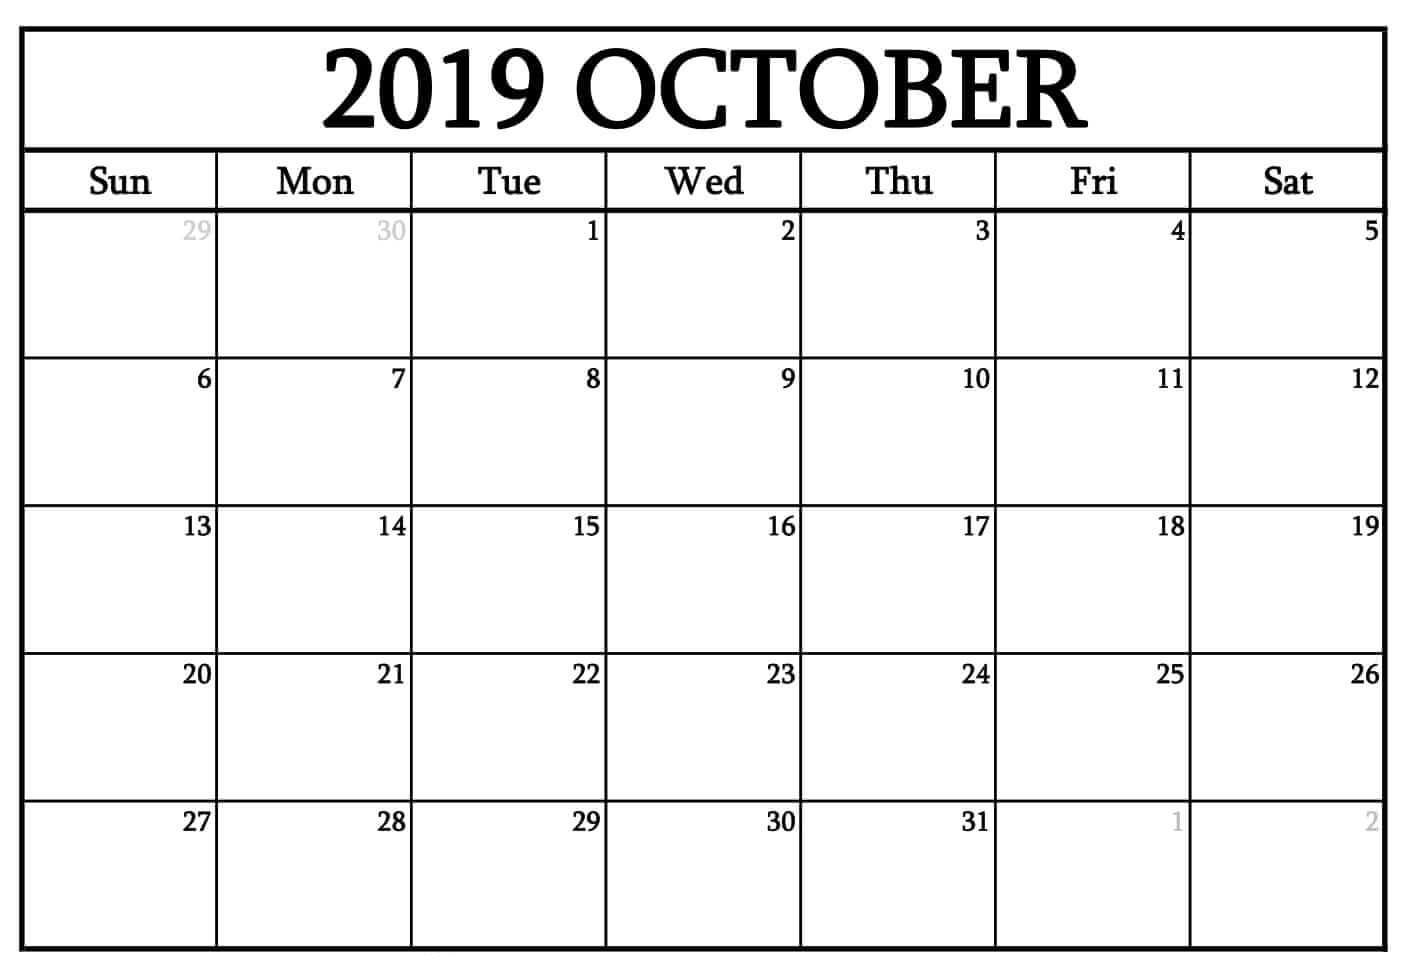 October 2019 Calendar Editable Template